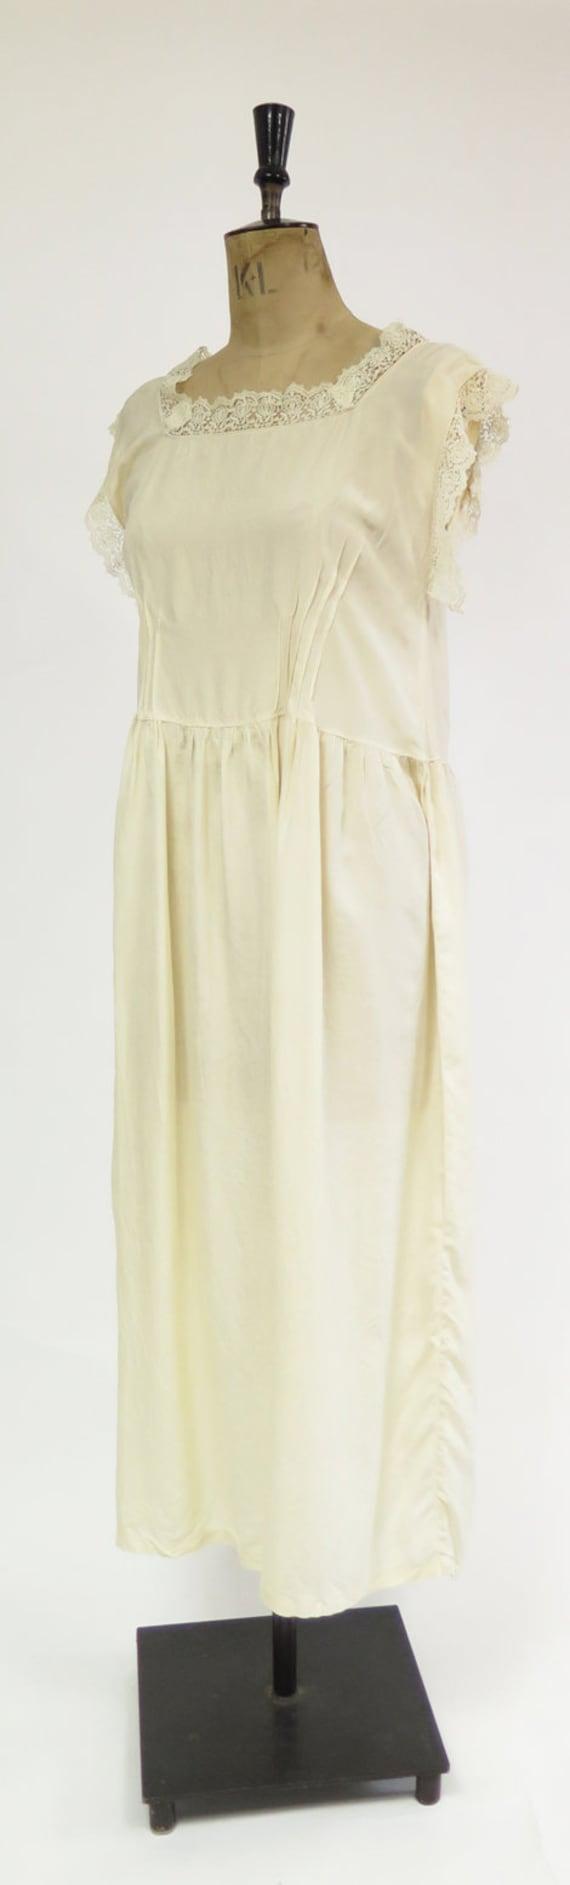 Original Vintage 1920s Deco Cream Silk And Lace D… - image 3